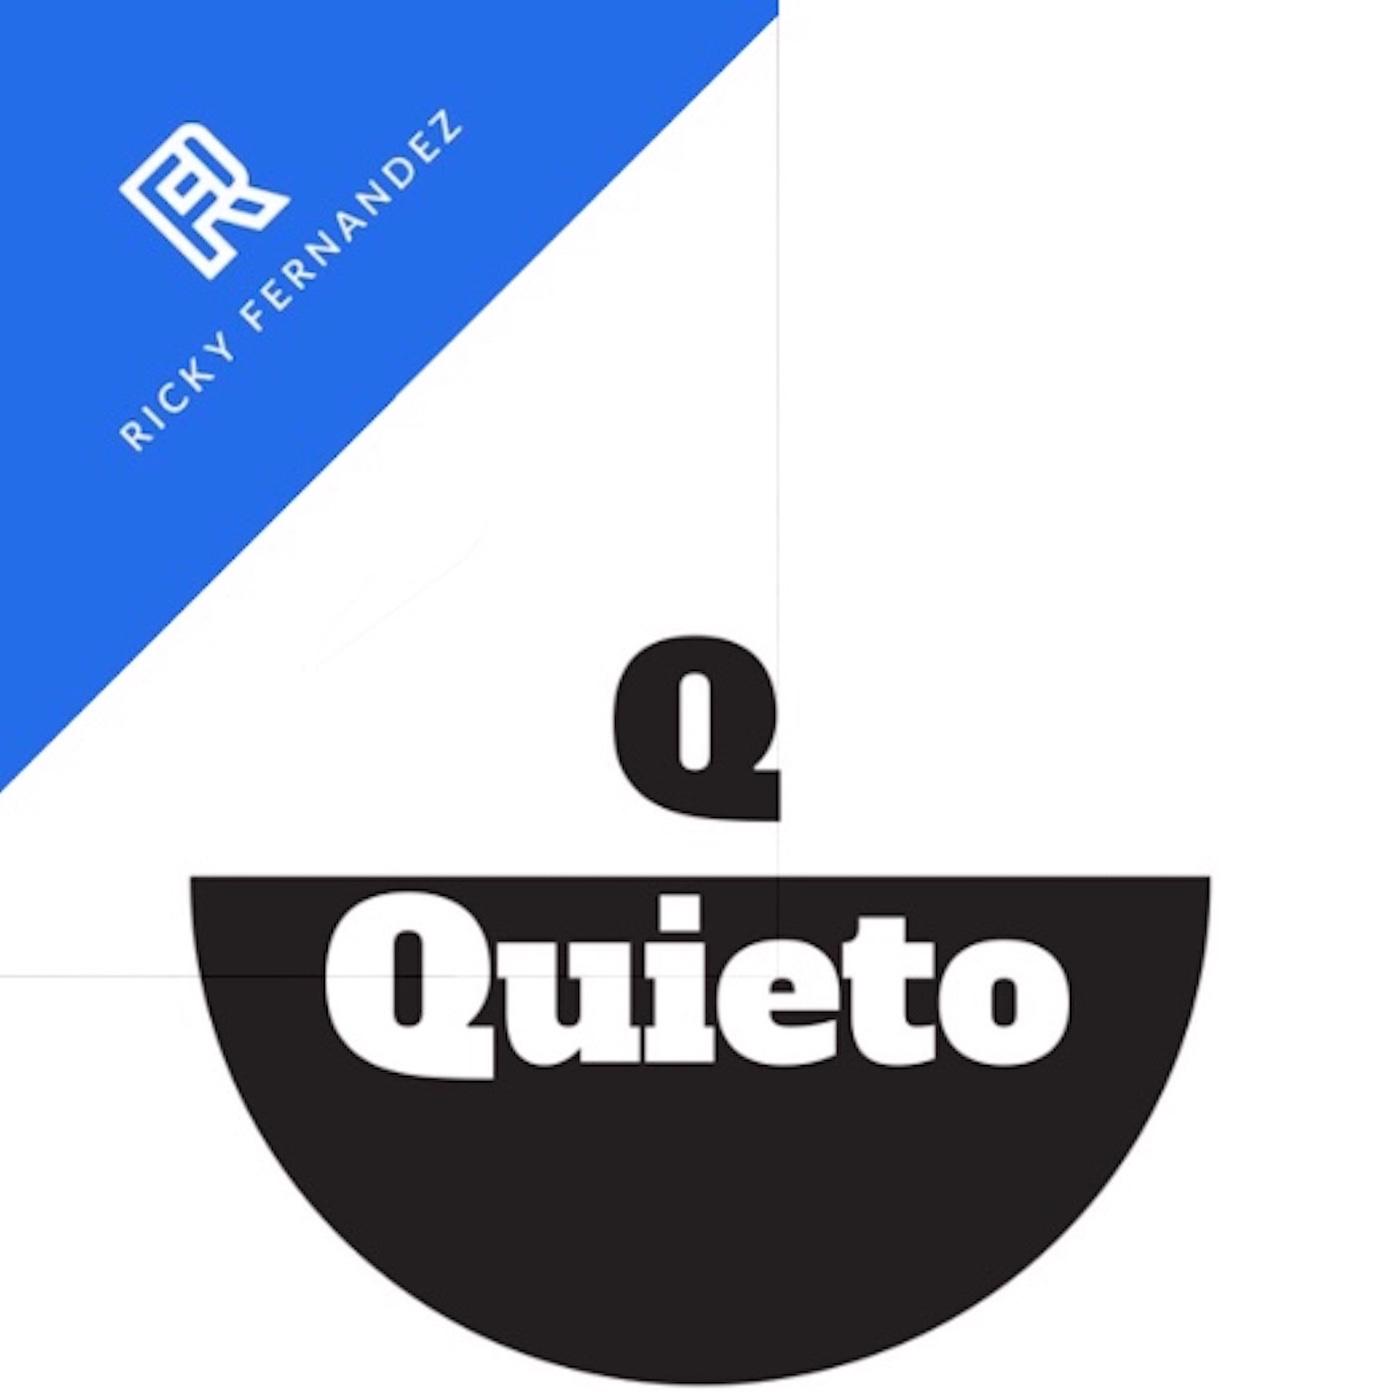 Quieto